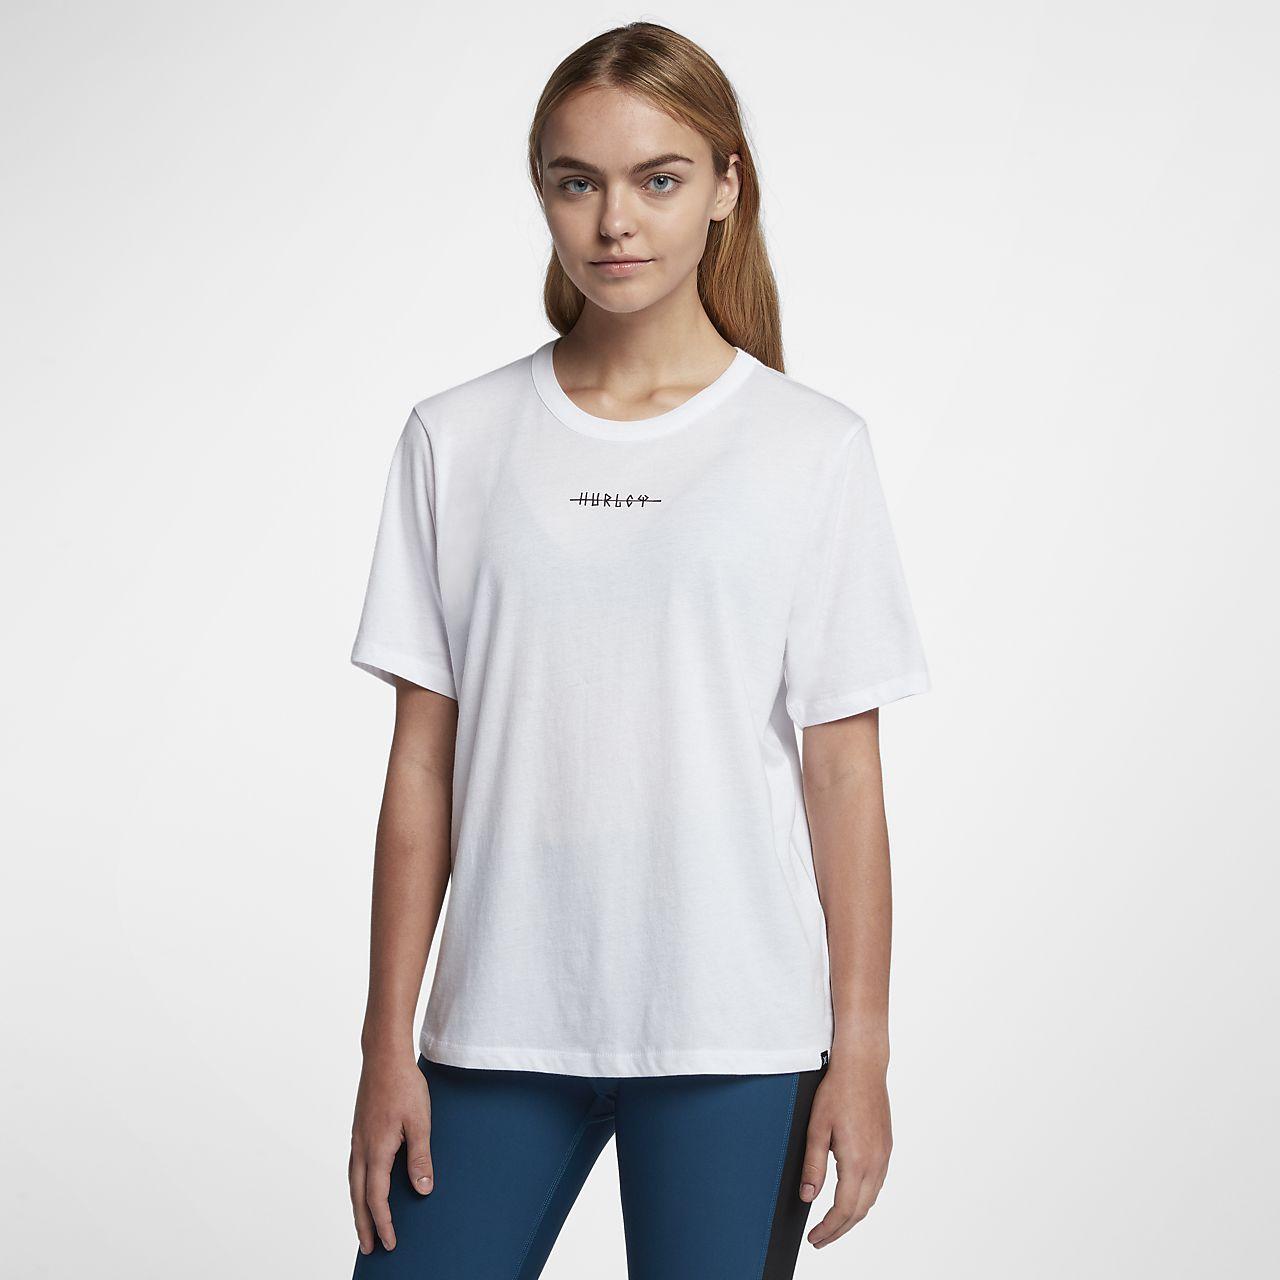 Hurley Island Ties Perfect Crew Women's T-Shirt